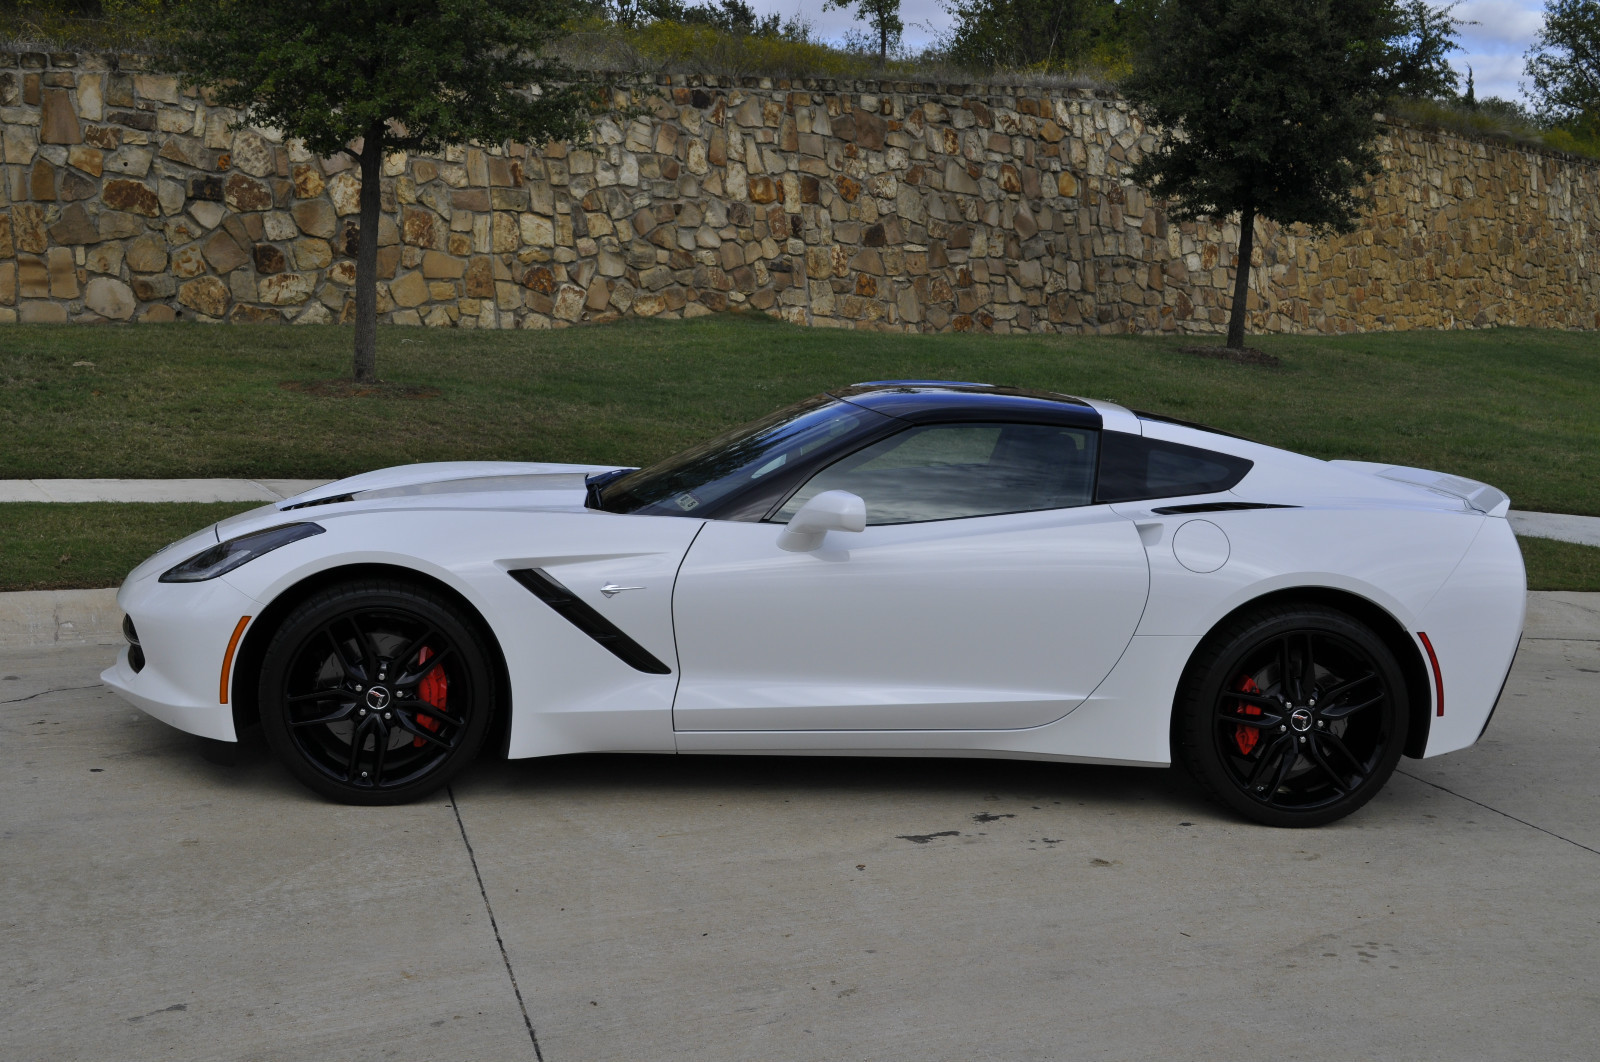 2014 Corvette Stingray For Sale >> White Stingray For Sale In Texas